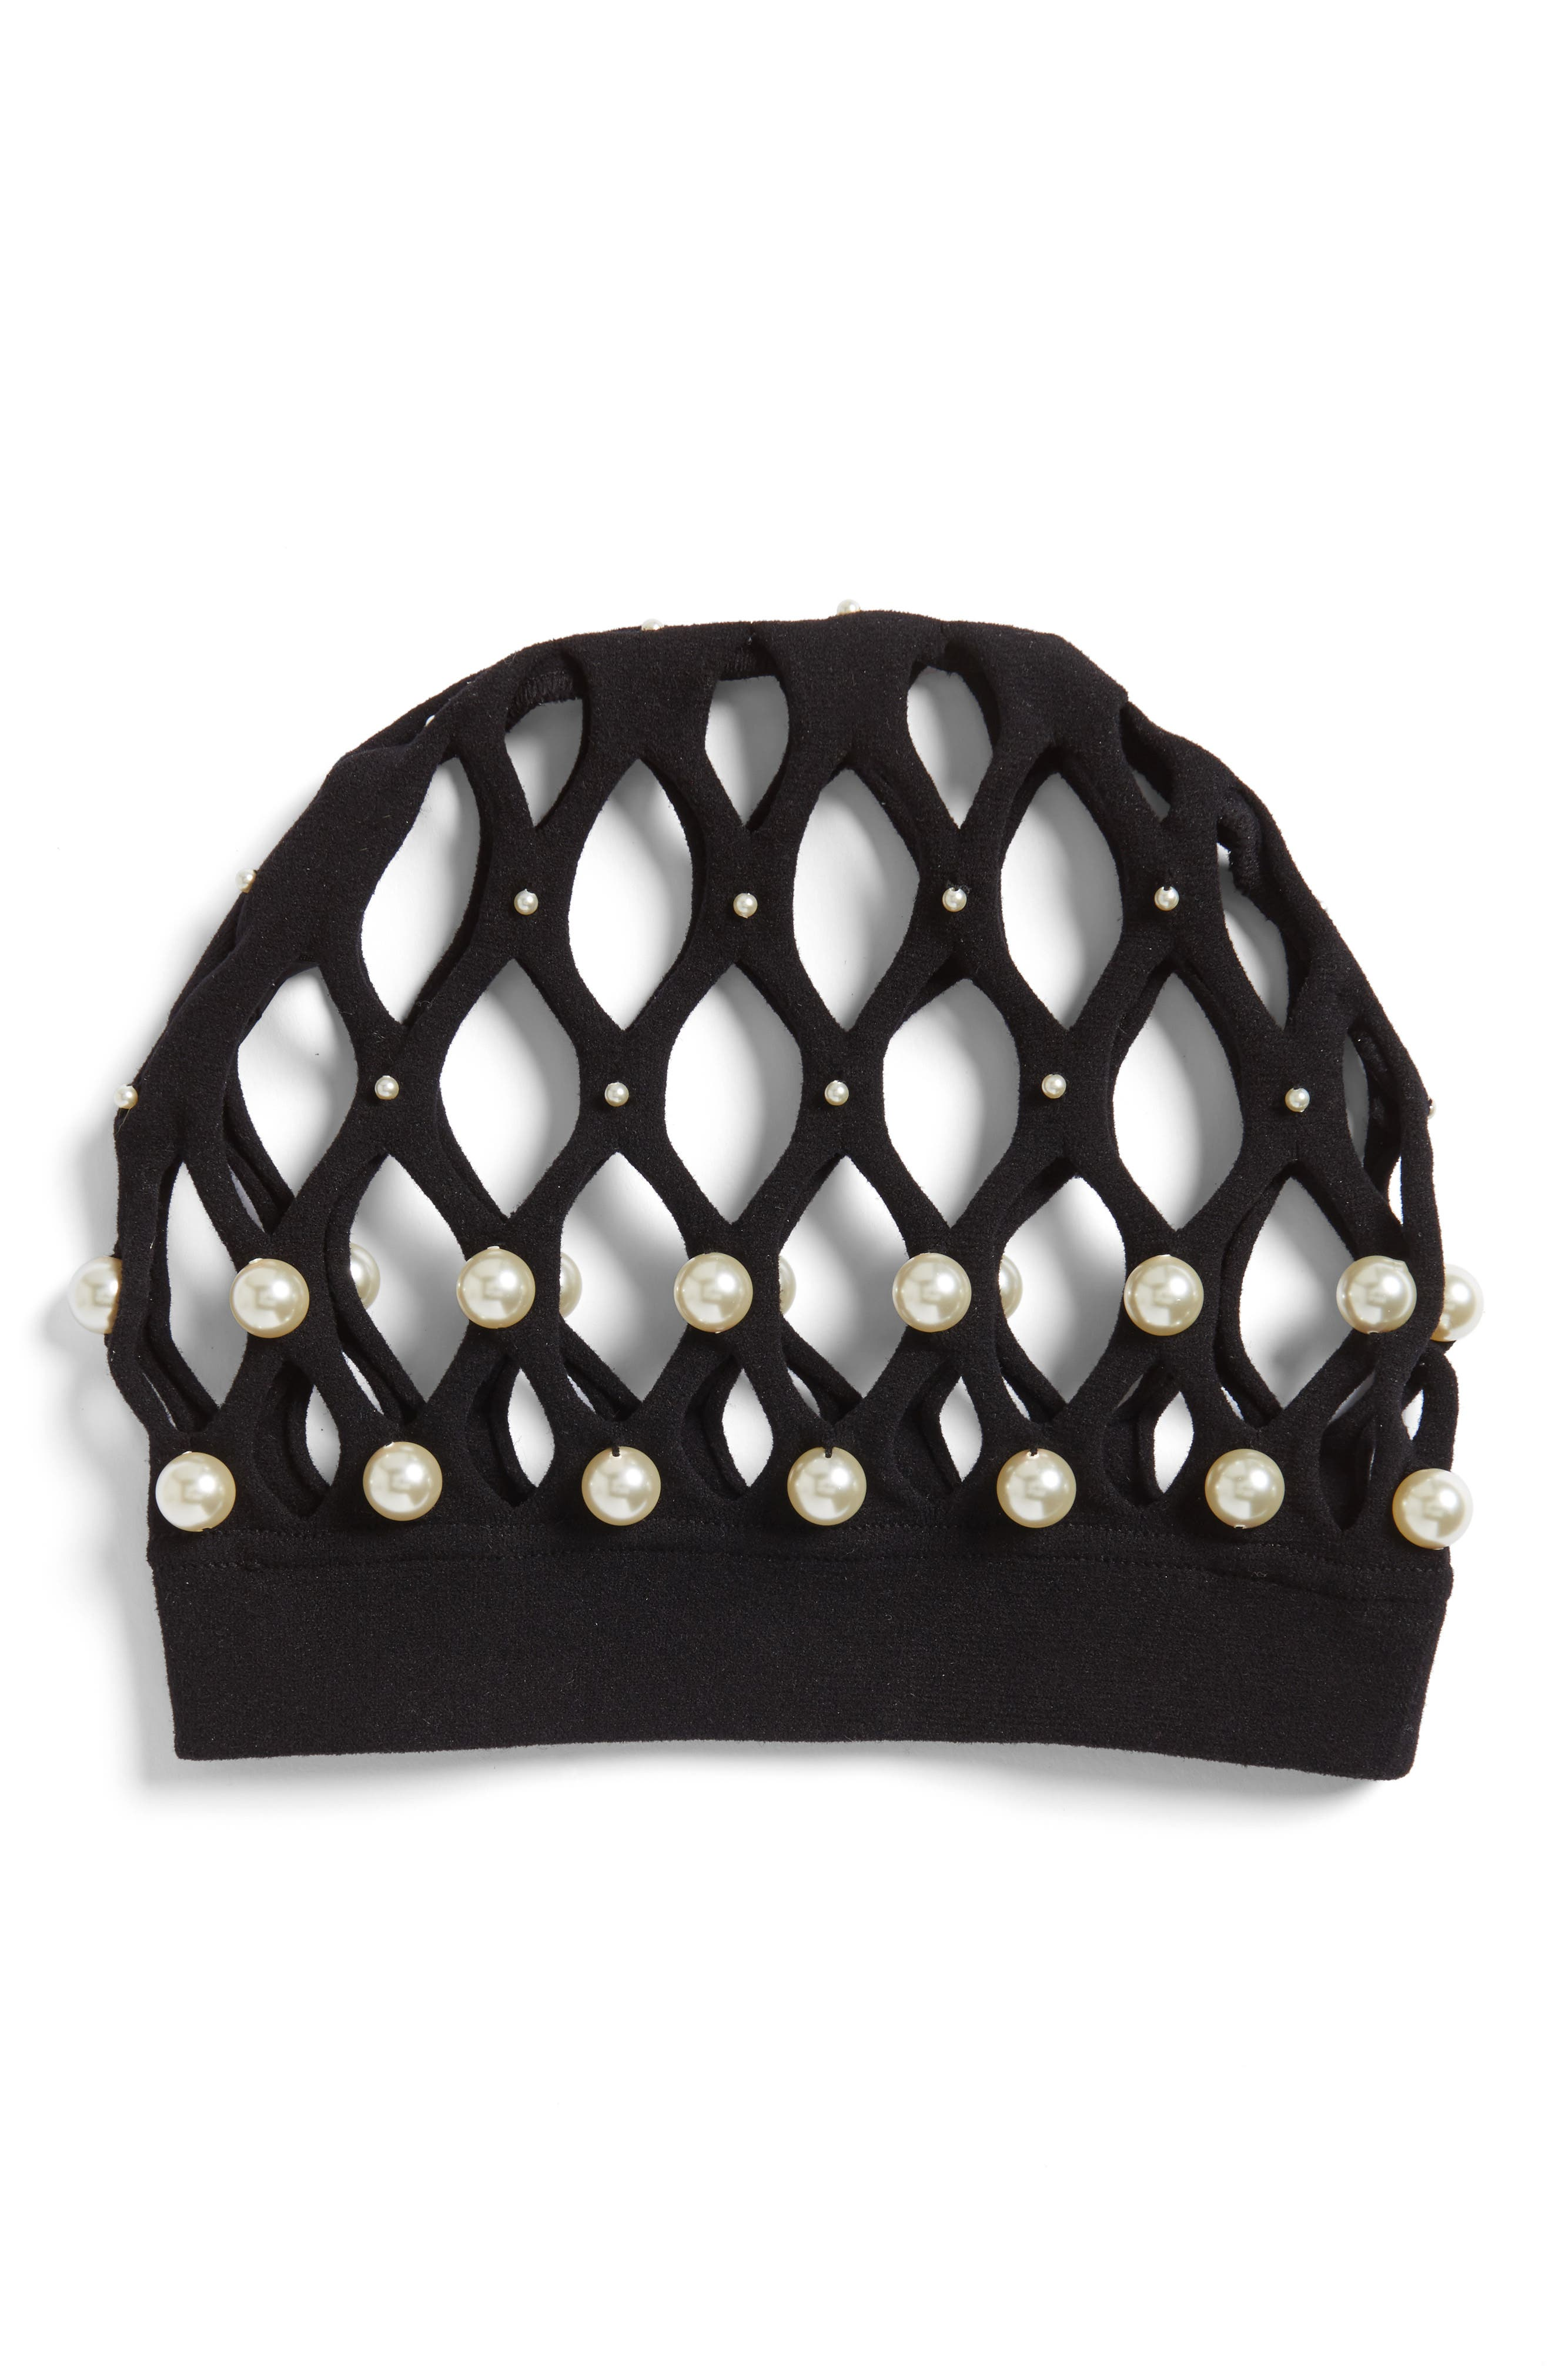 Gucci Imitation Pearl Hair Net